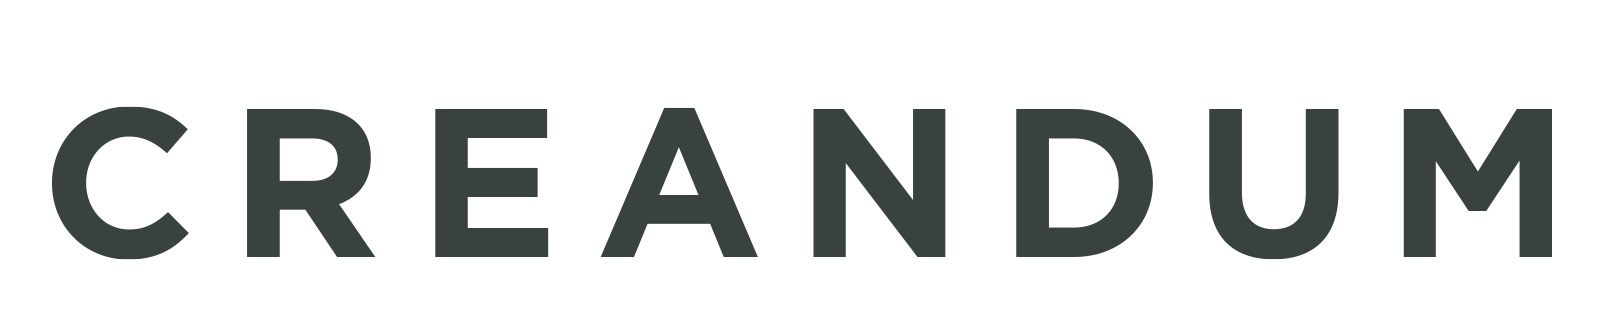 creandum-logo.png